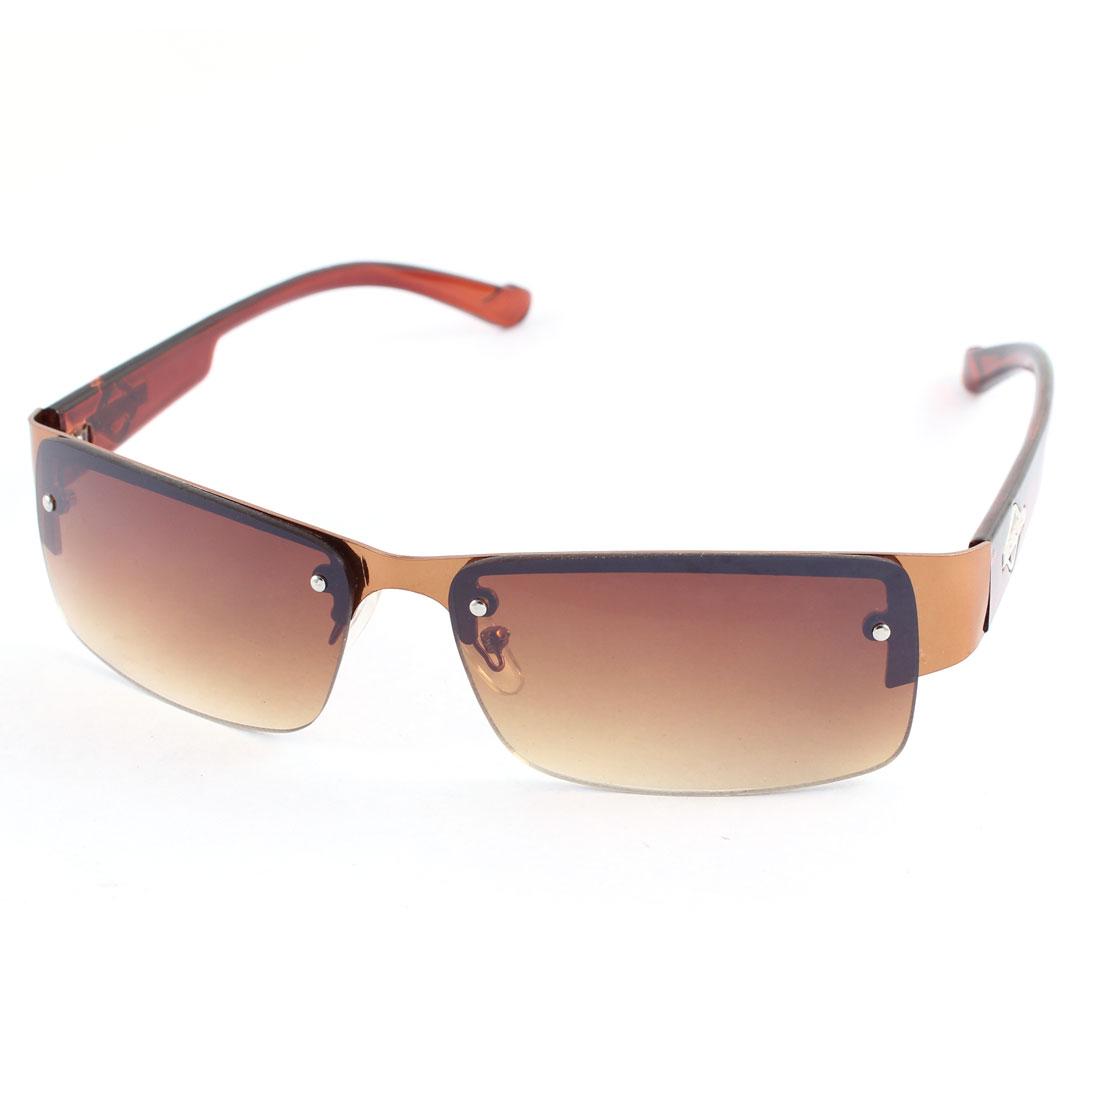 Lady Women Plastic Half Rim Rectangle Len Sunglass Eye Protection Eyewear Brown